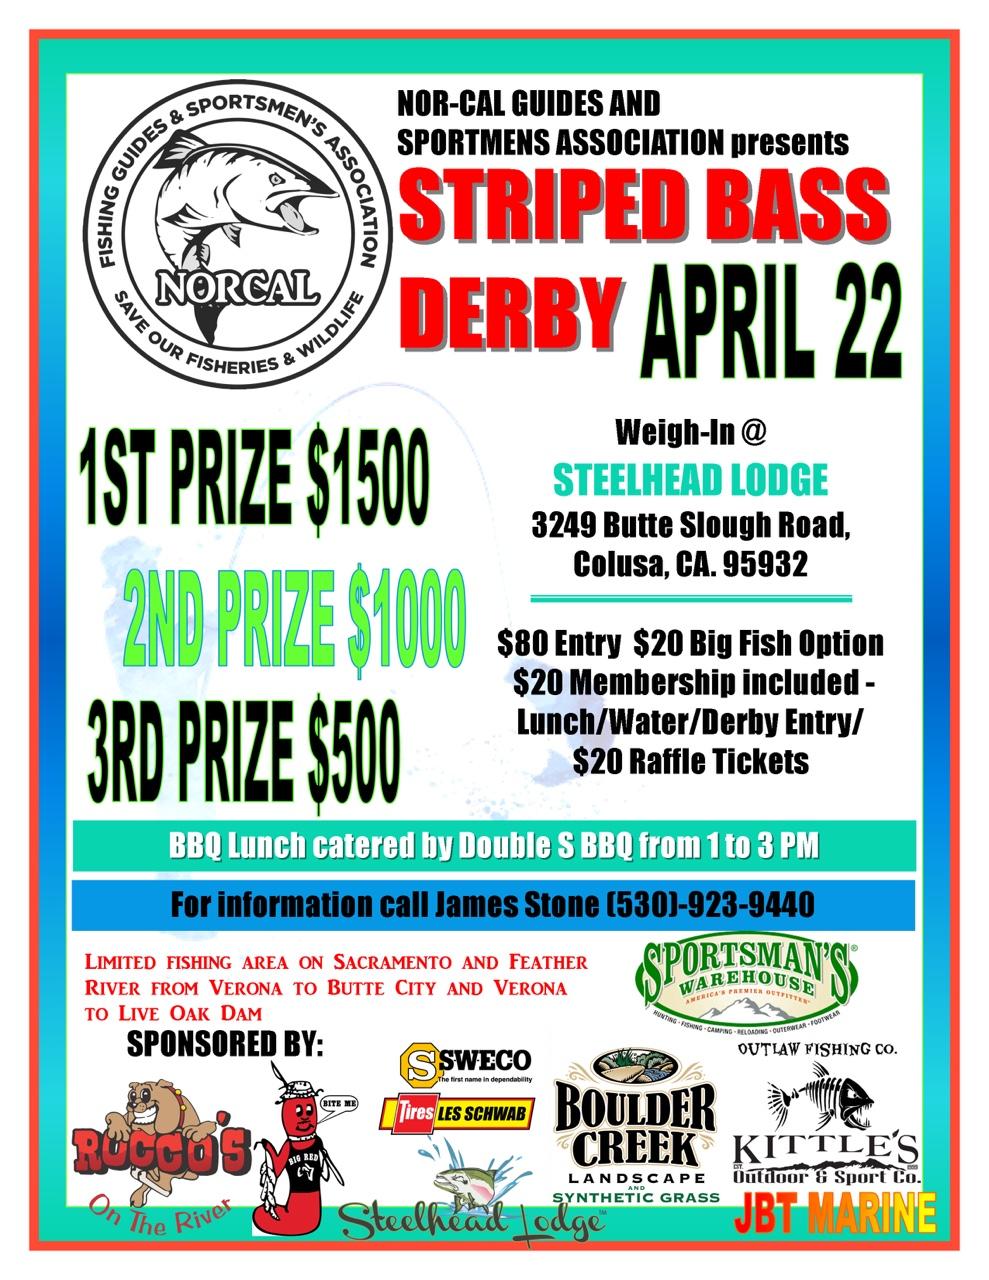 NCGASA Striper derby flyer!